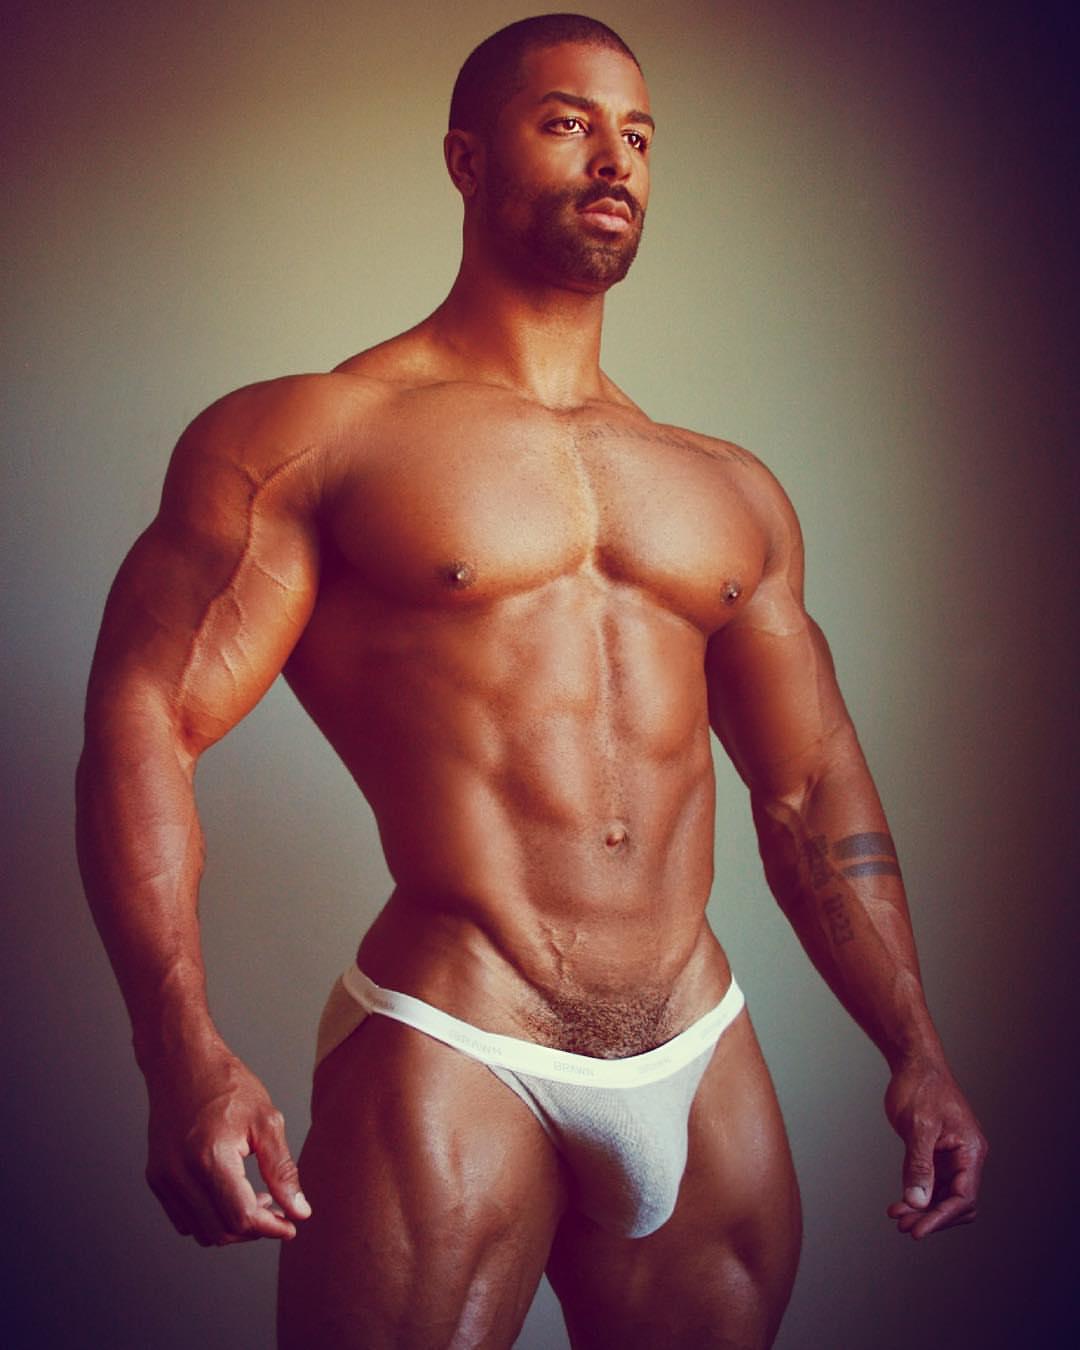 Big Uncut Cock Arab Fucking A White Hairy Muscle Hunk